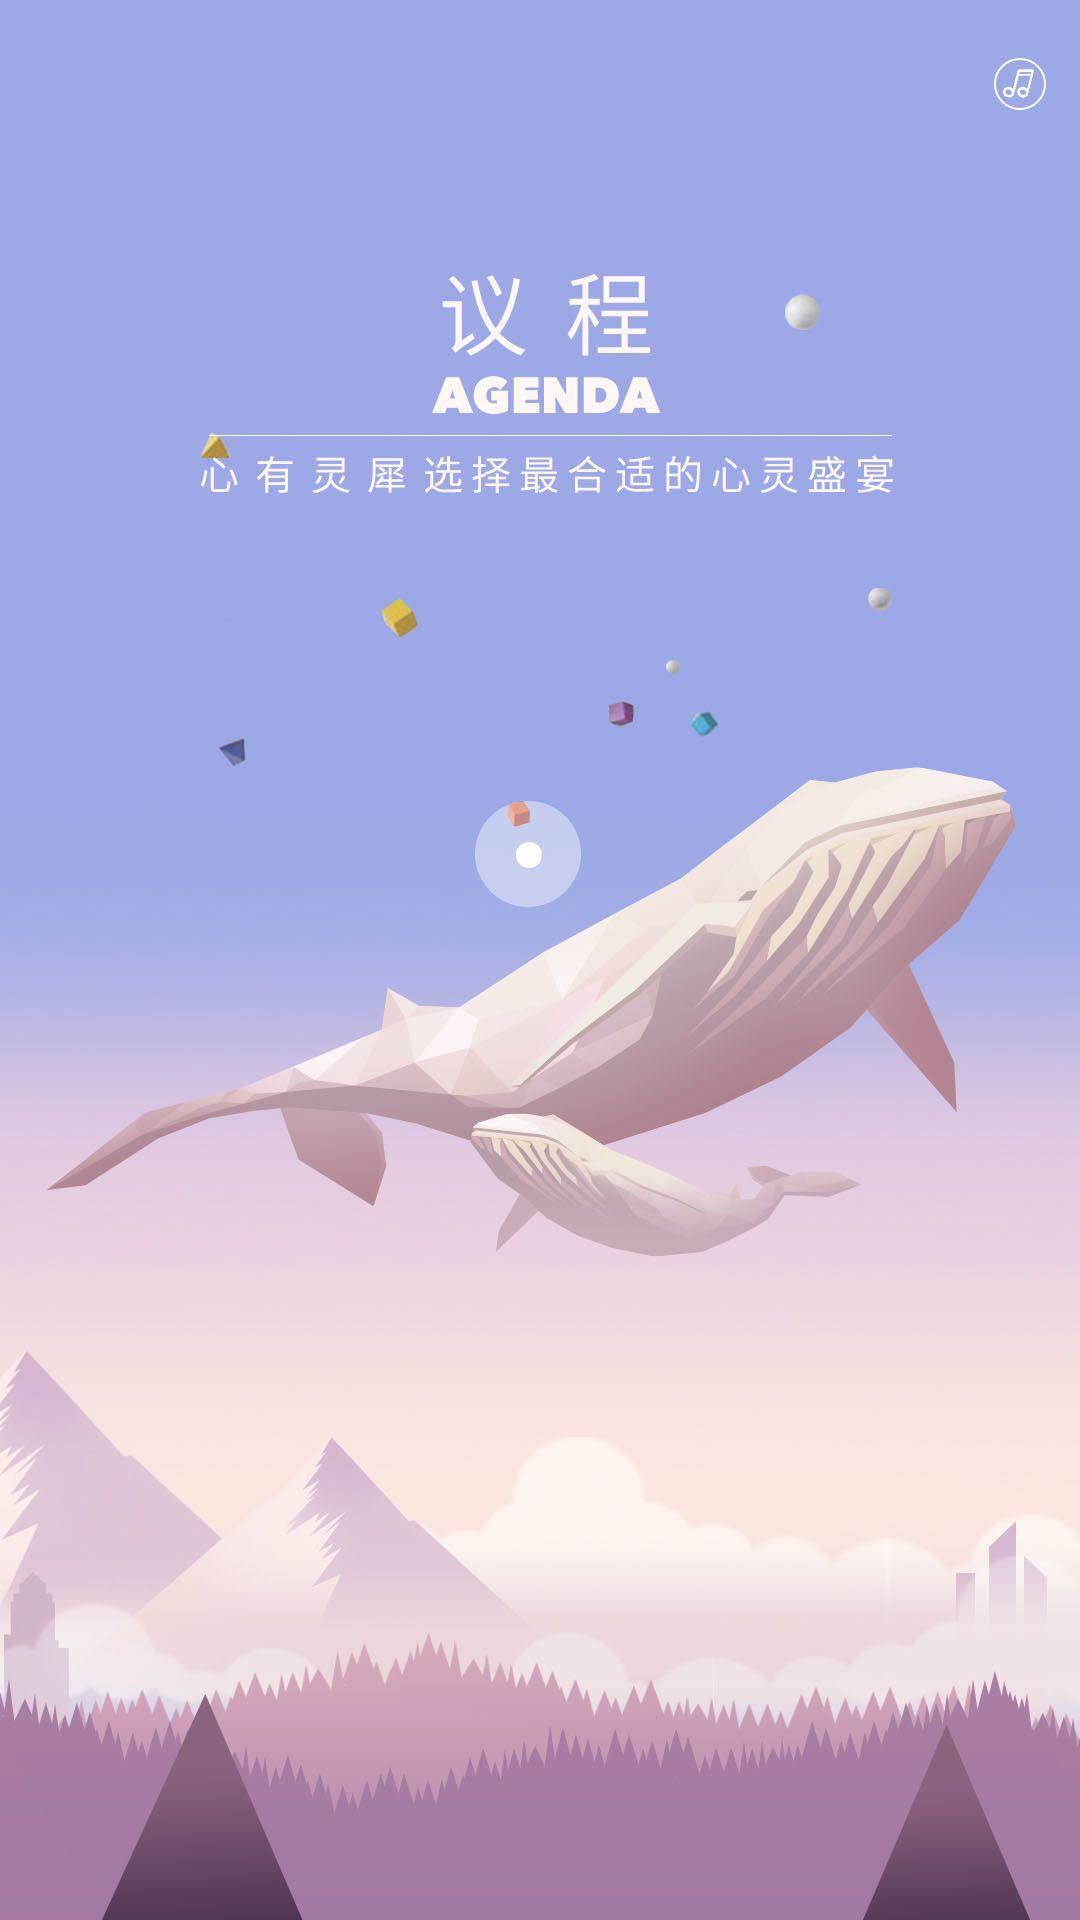 Advertising-Infographics-【2016_HTML5移动生态大会】H5邀请函-UI中国用户体验设计平台 Advertising Infographics : 【2016_HTML5移动生态大会】H5邀请函-UI中国用户体验设计平台